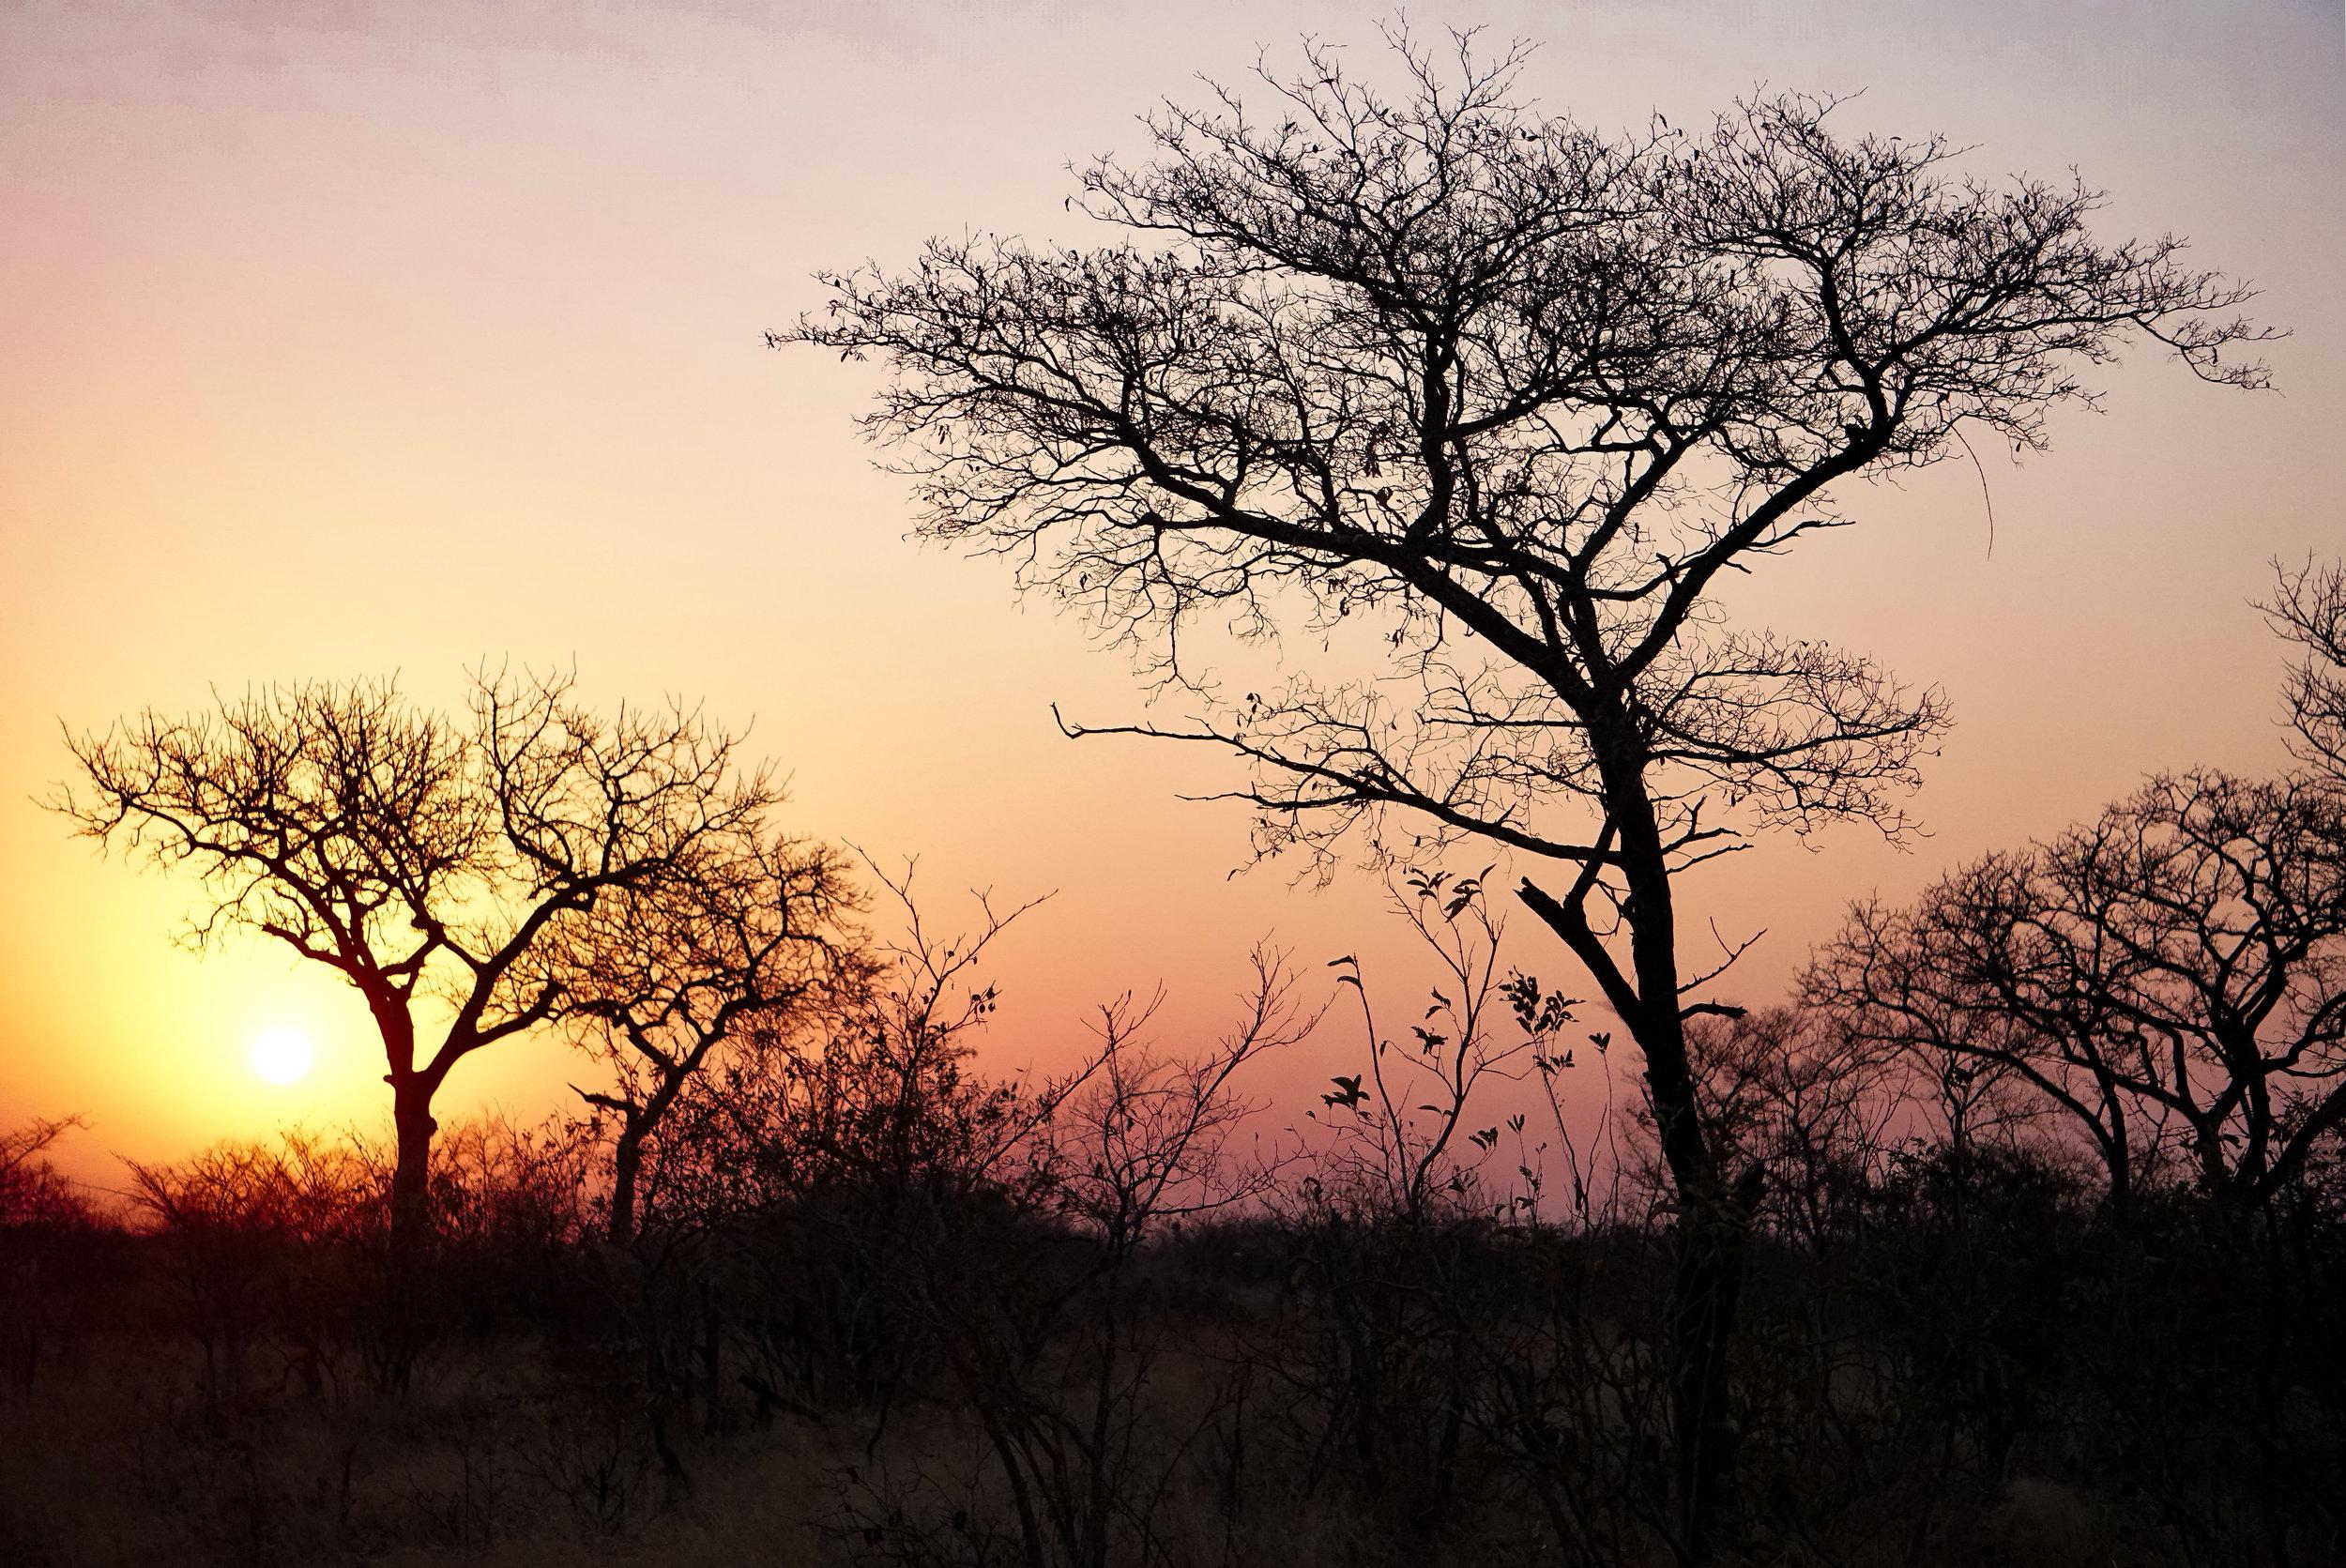 htk.photography.south.africa.safari.trees.sunset.landscape.jpg